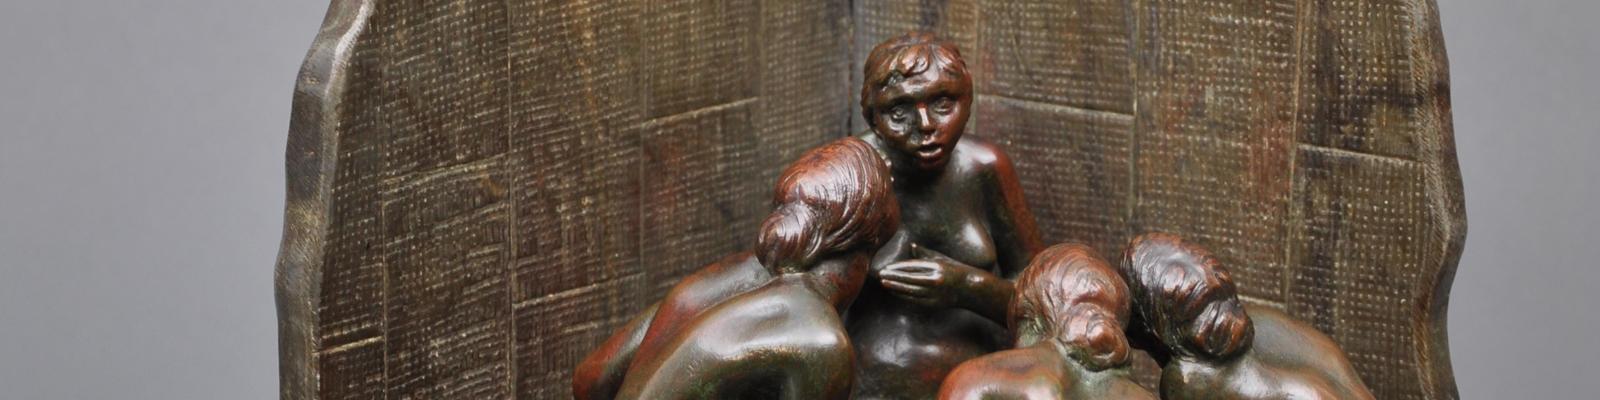 La collection Camille Claudel